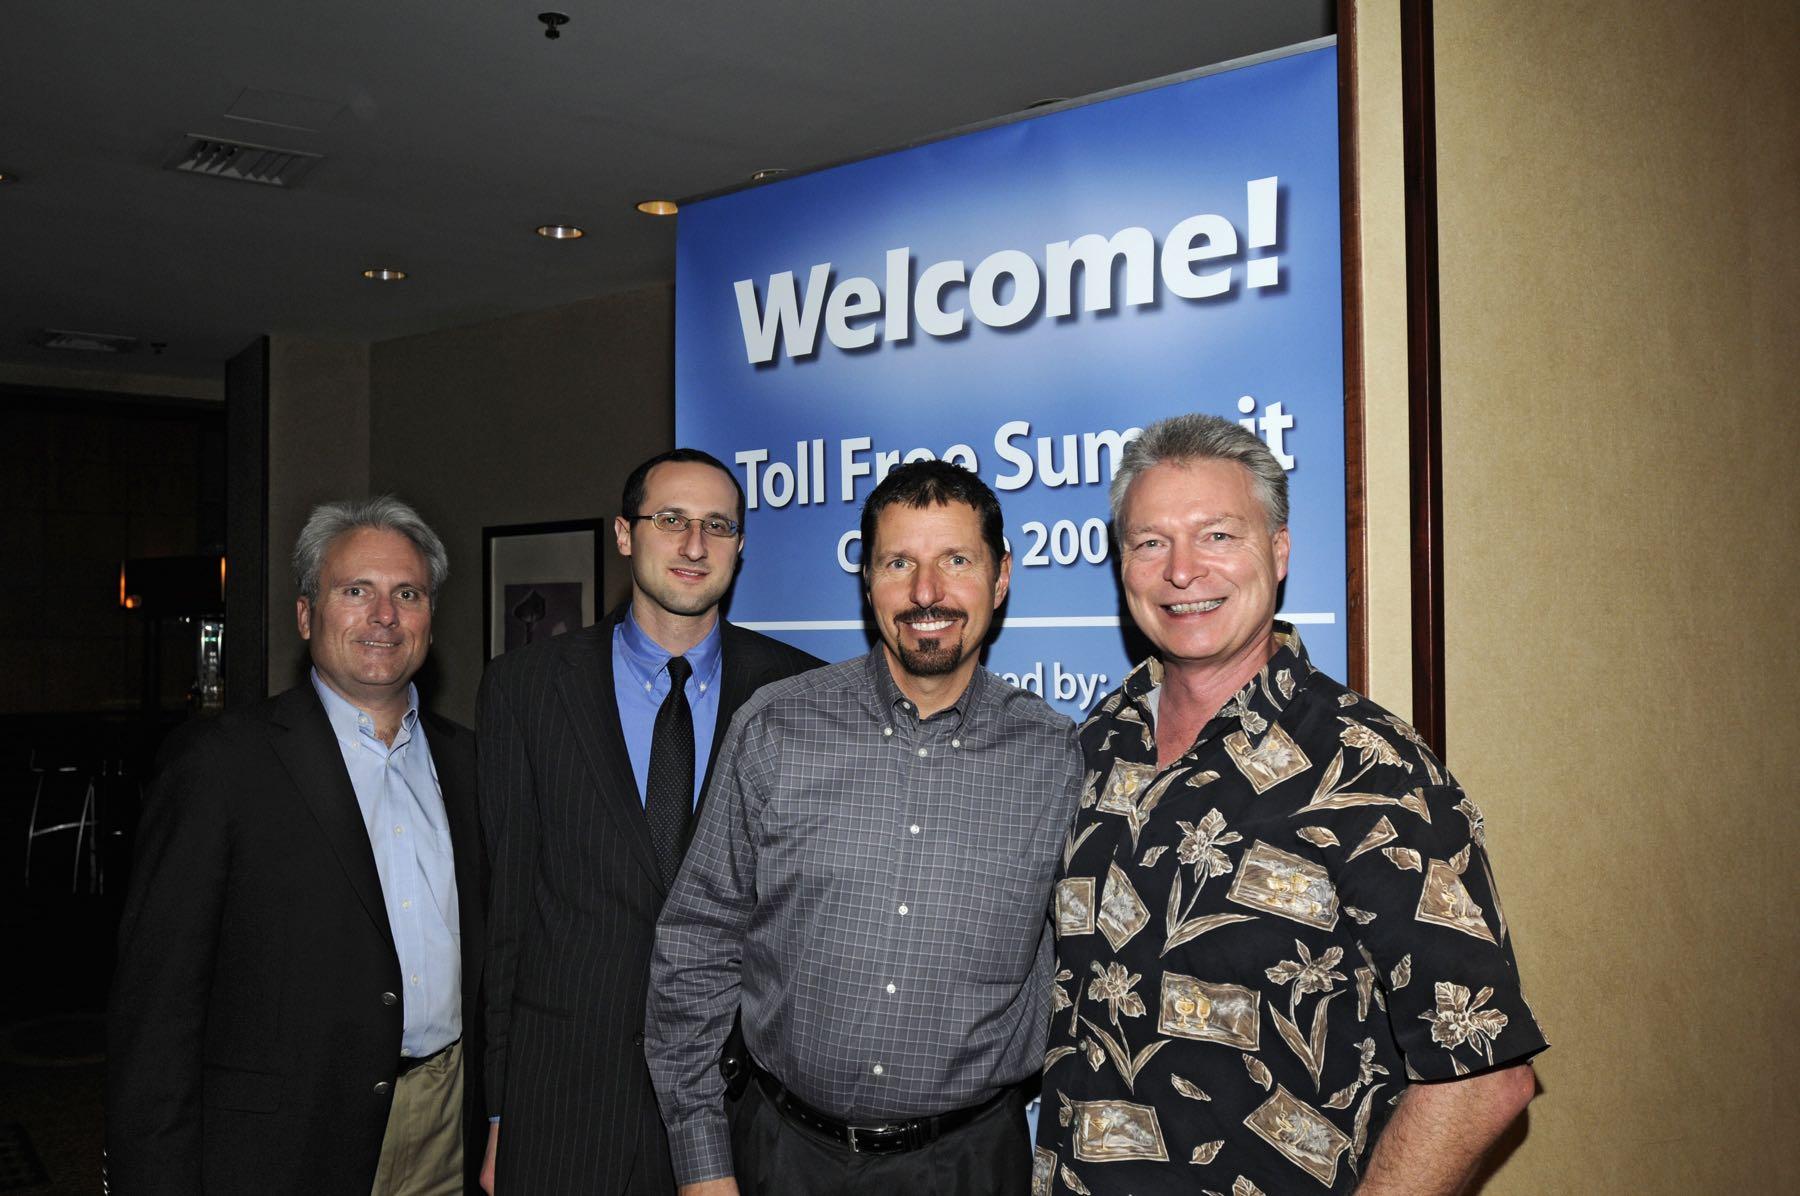 Toll-Free-Summit.Welcom.jpg